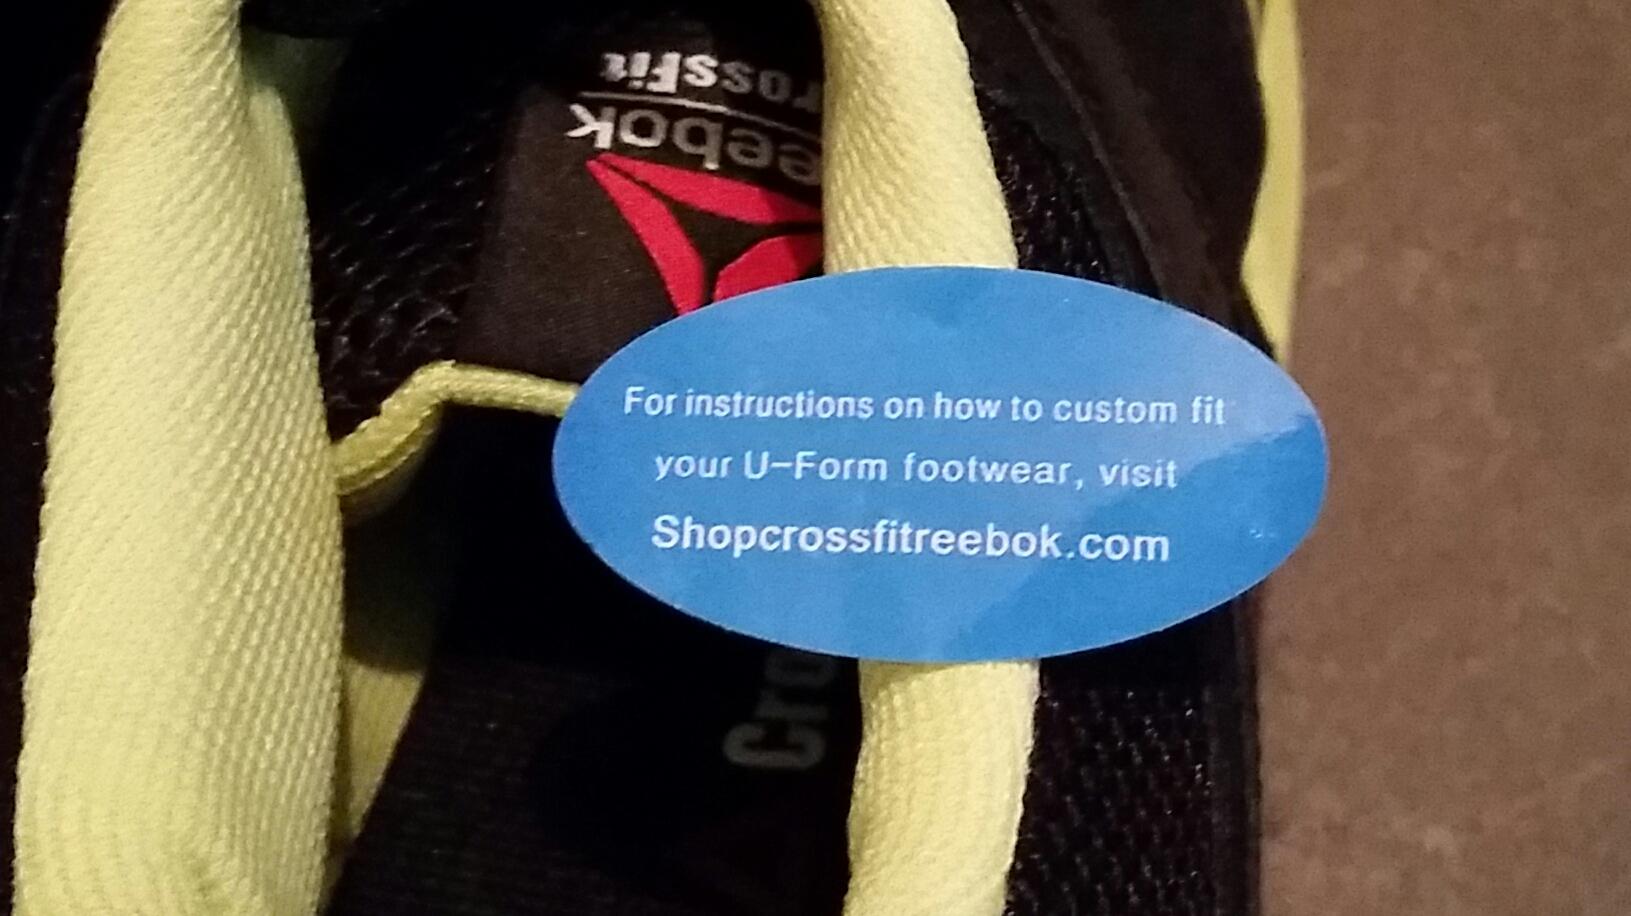 shopcrossfitreebok u form instructions